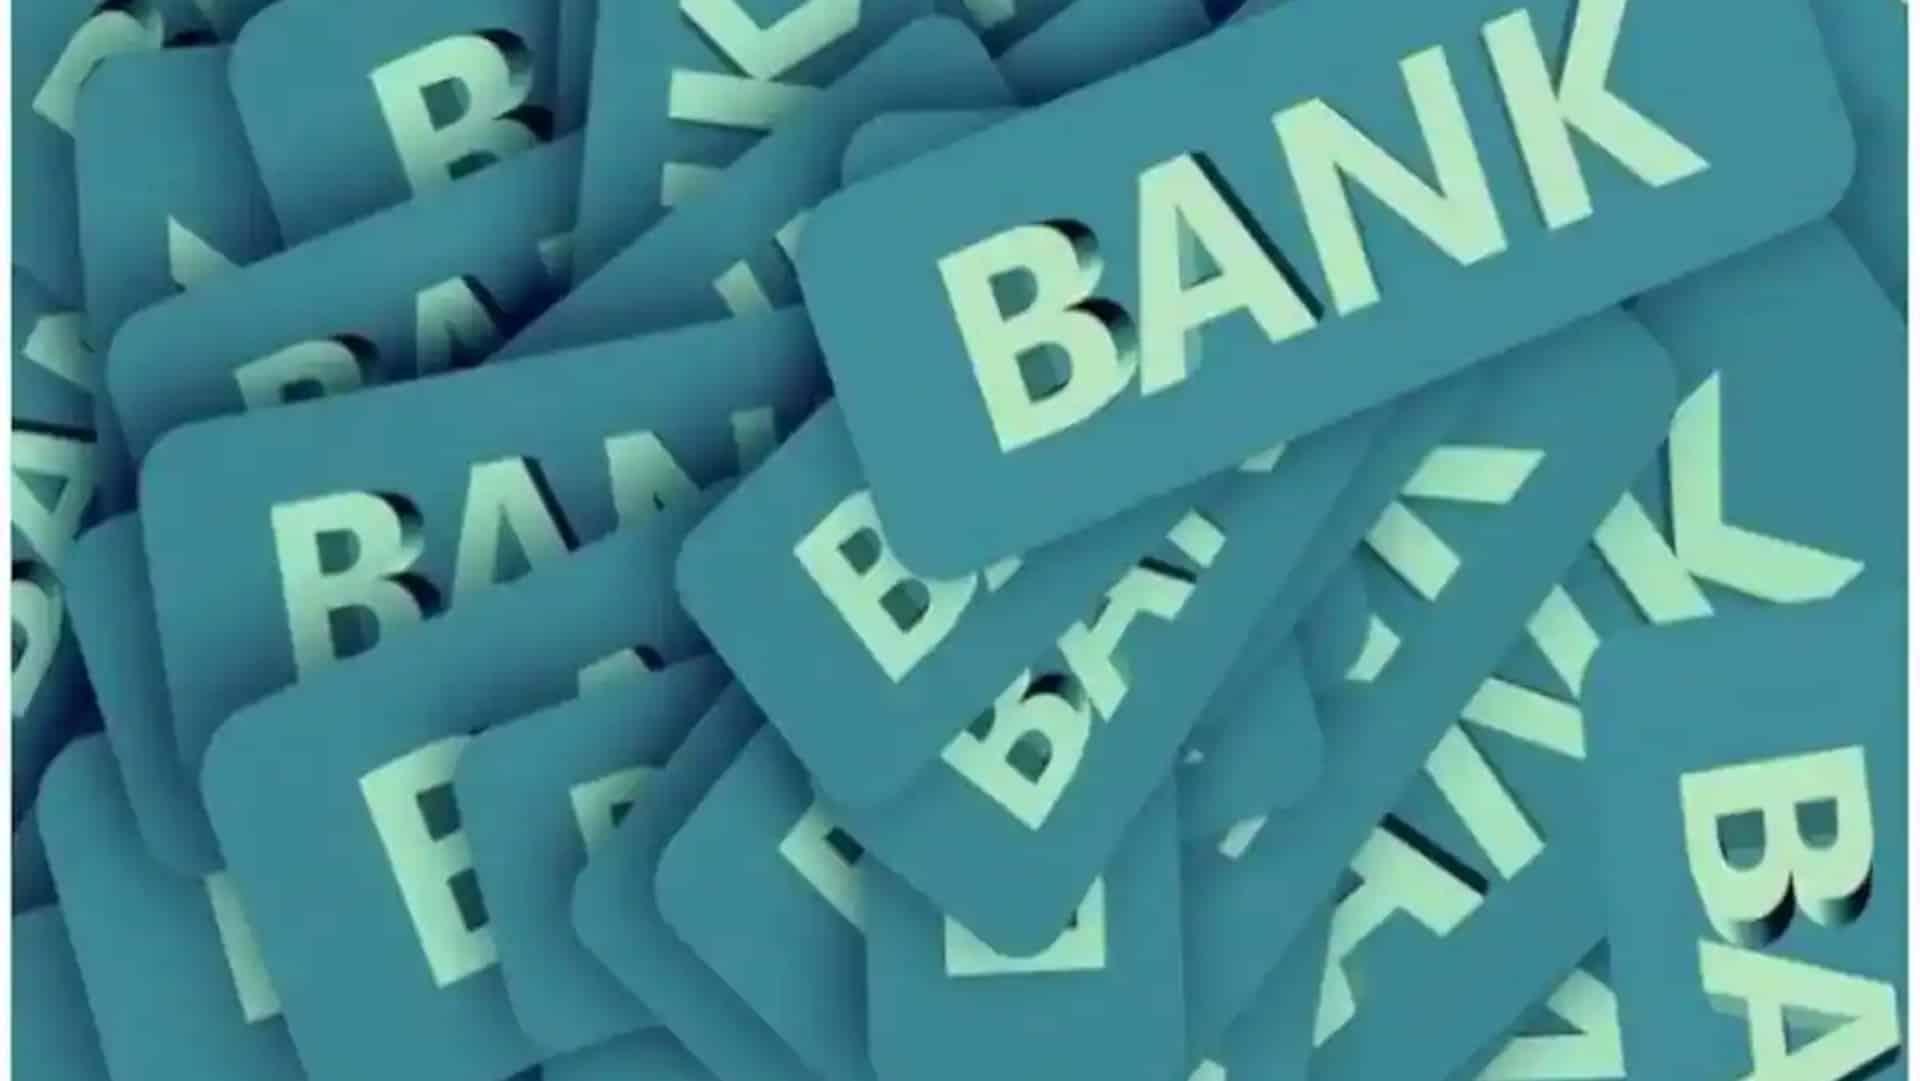 Bank Privatisation is nothing but just a political agenda: Prof. K. Nageshwar